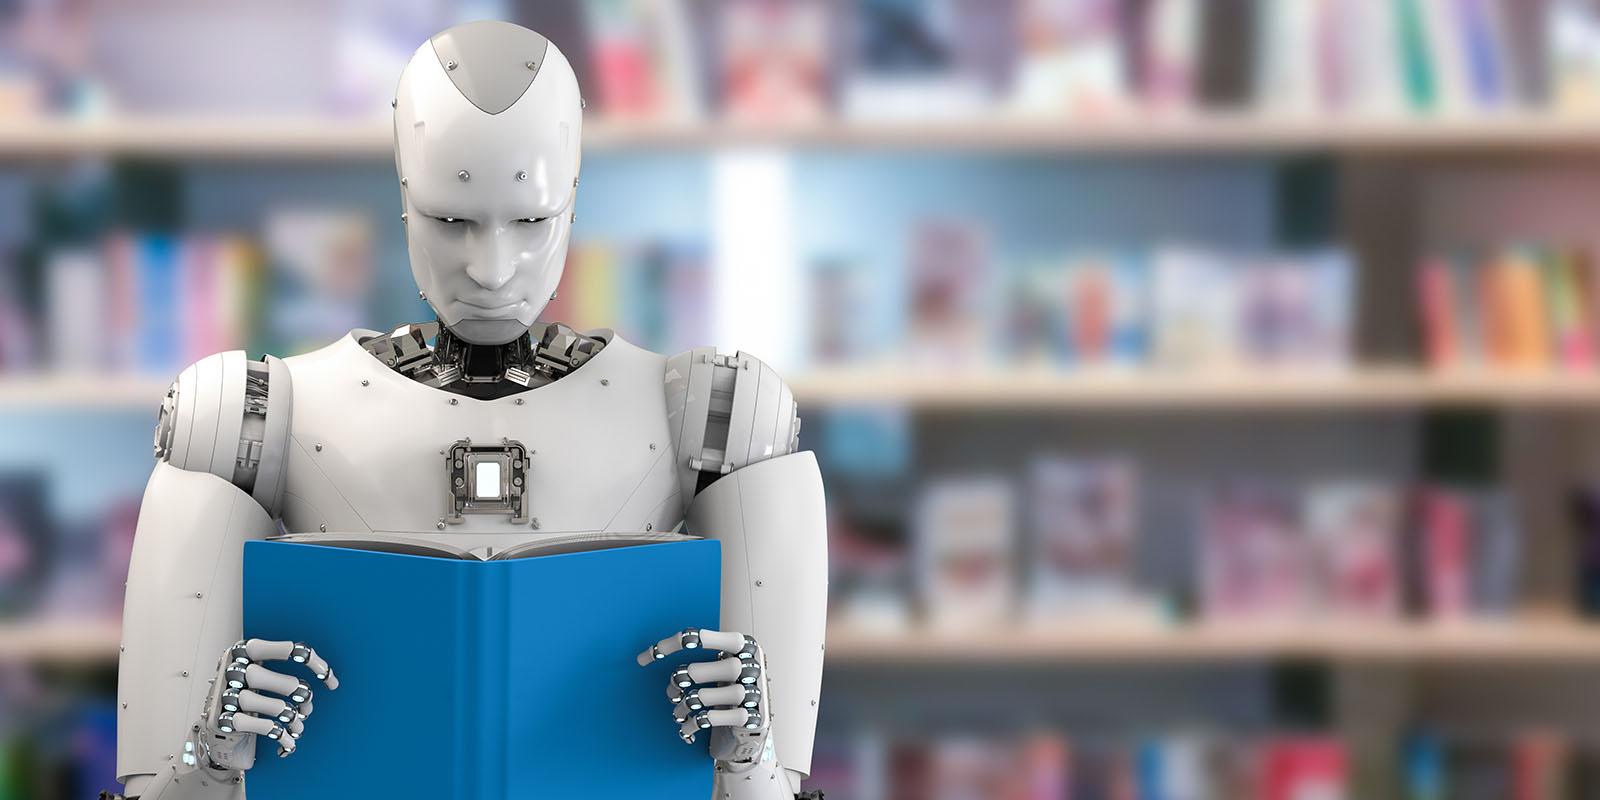 AI Robots in Class